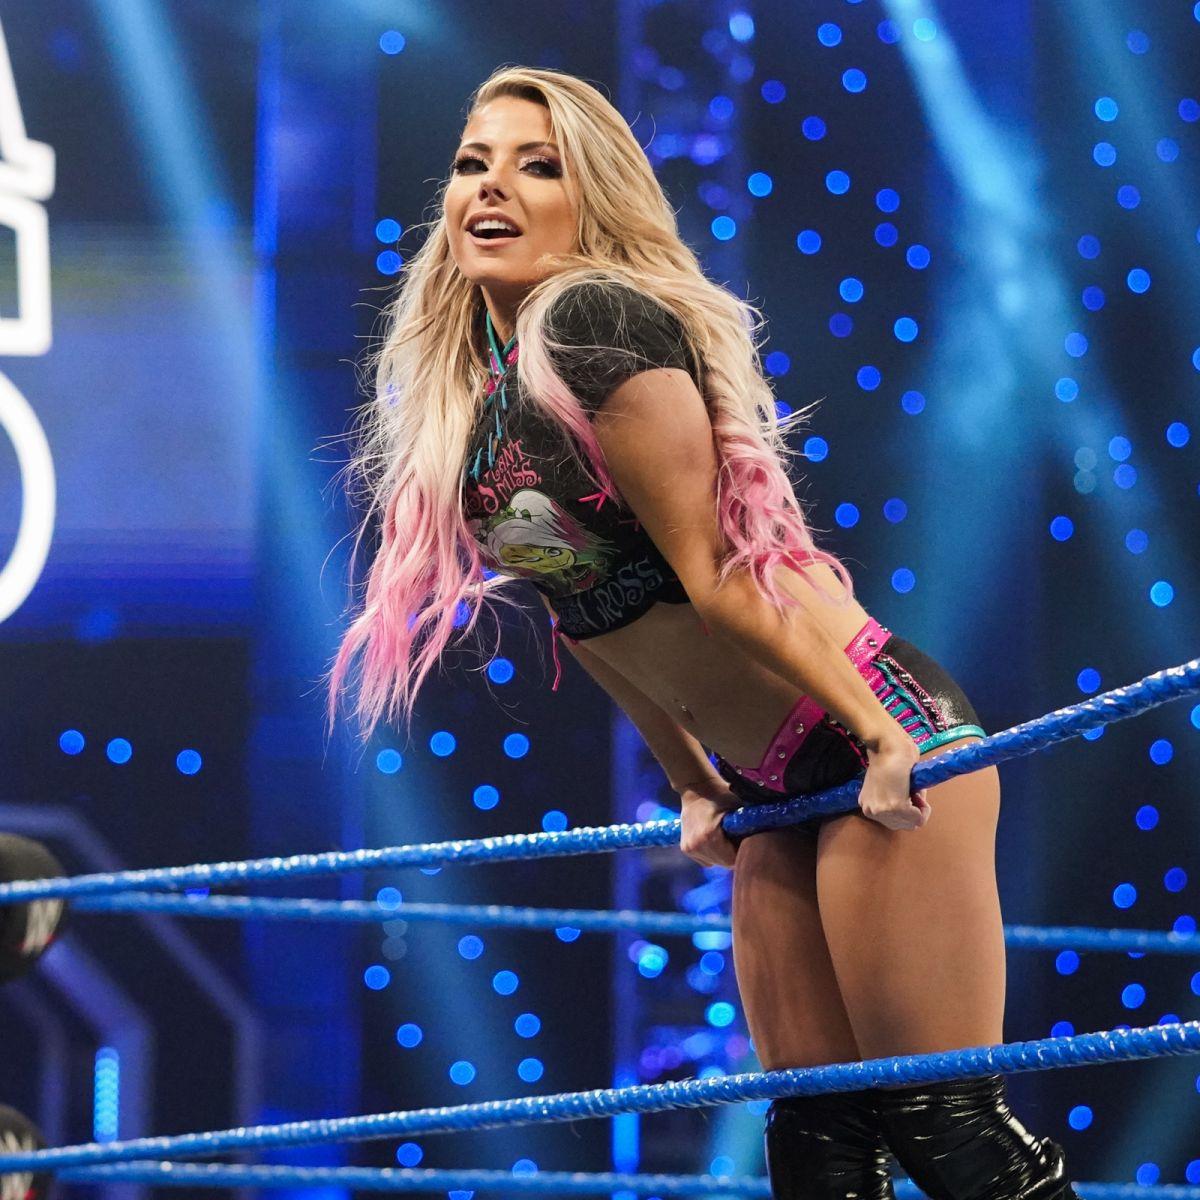 WWE Canceling Wrestlemania Match Featuring Alexa Bliss & Asuka 1